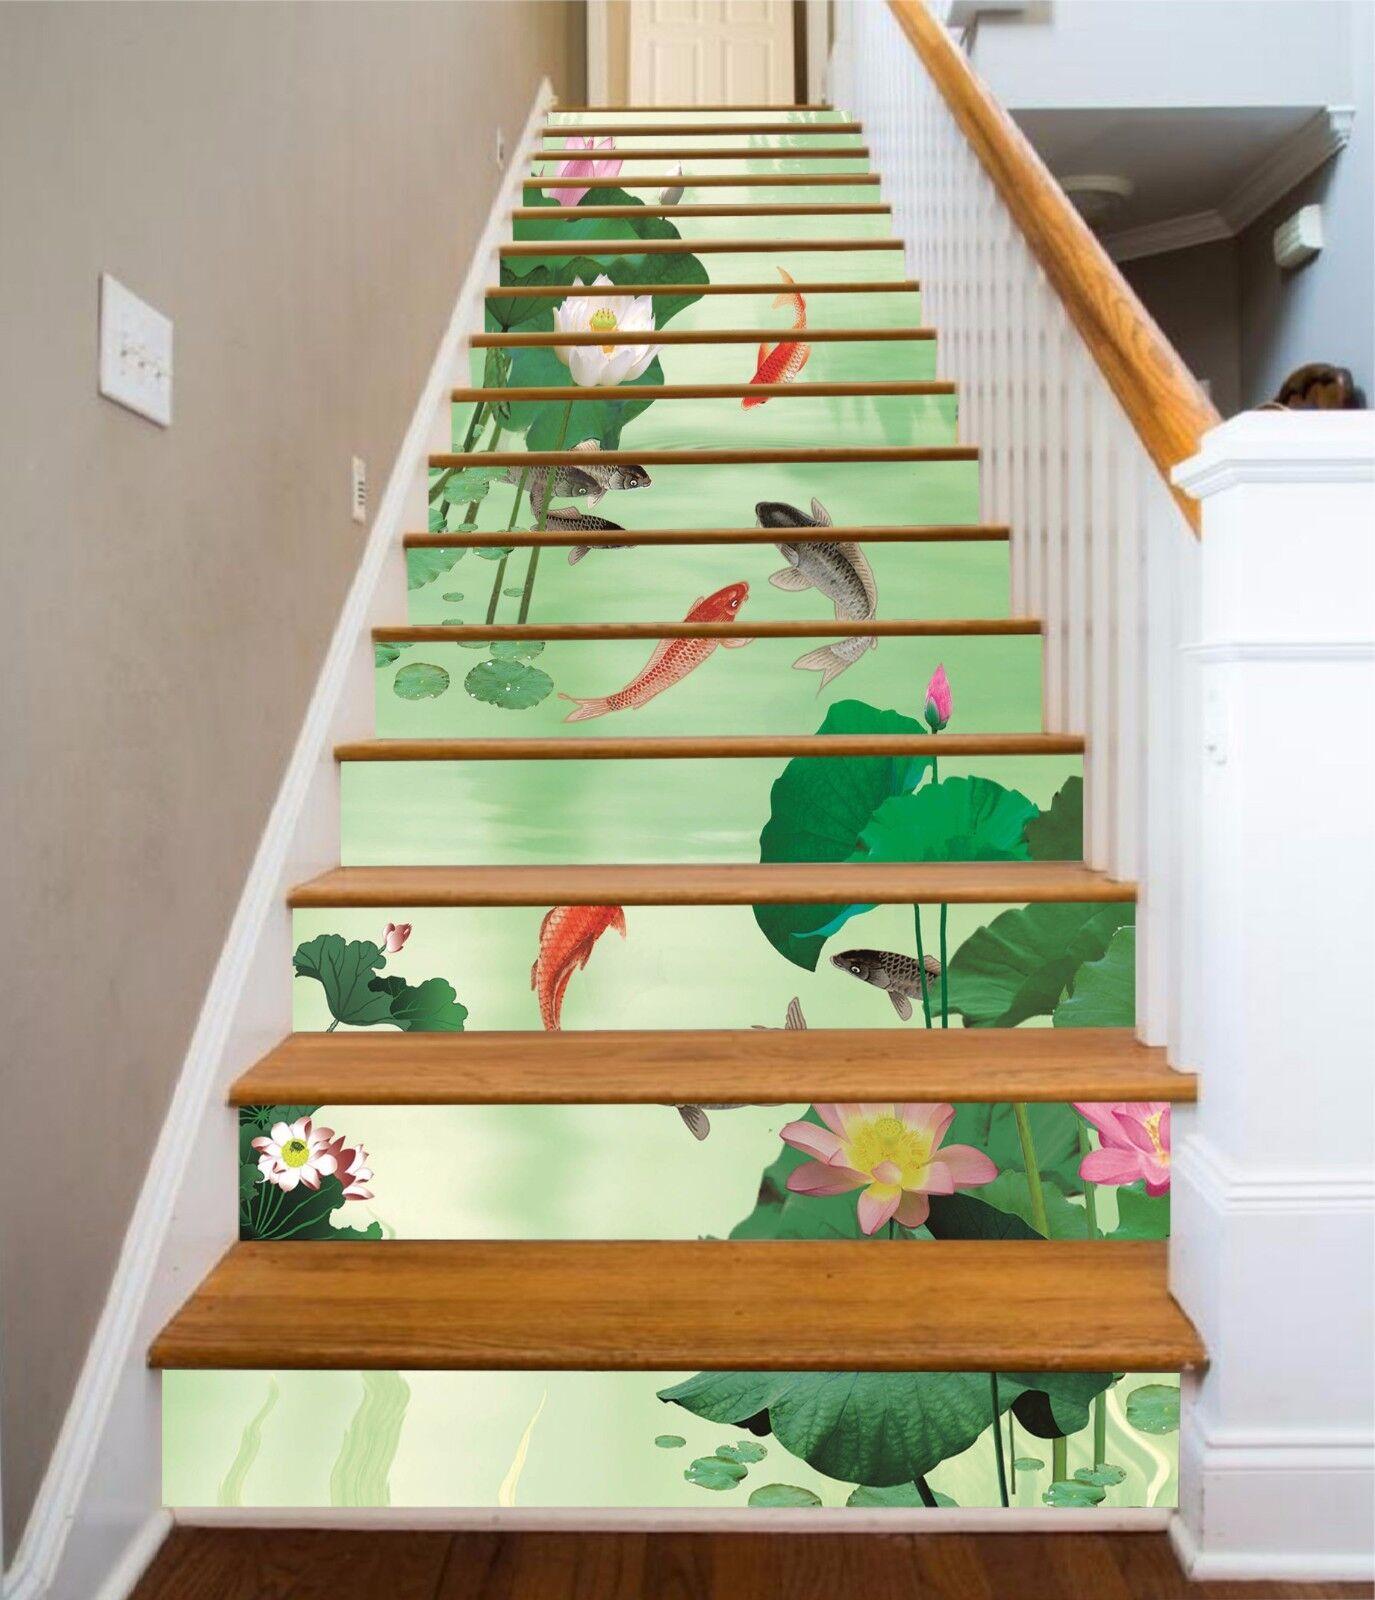 3D Lotus Carp 8357 Stair Risers Decoration Photo Mural Vinyl Decal Wallpaper AU